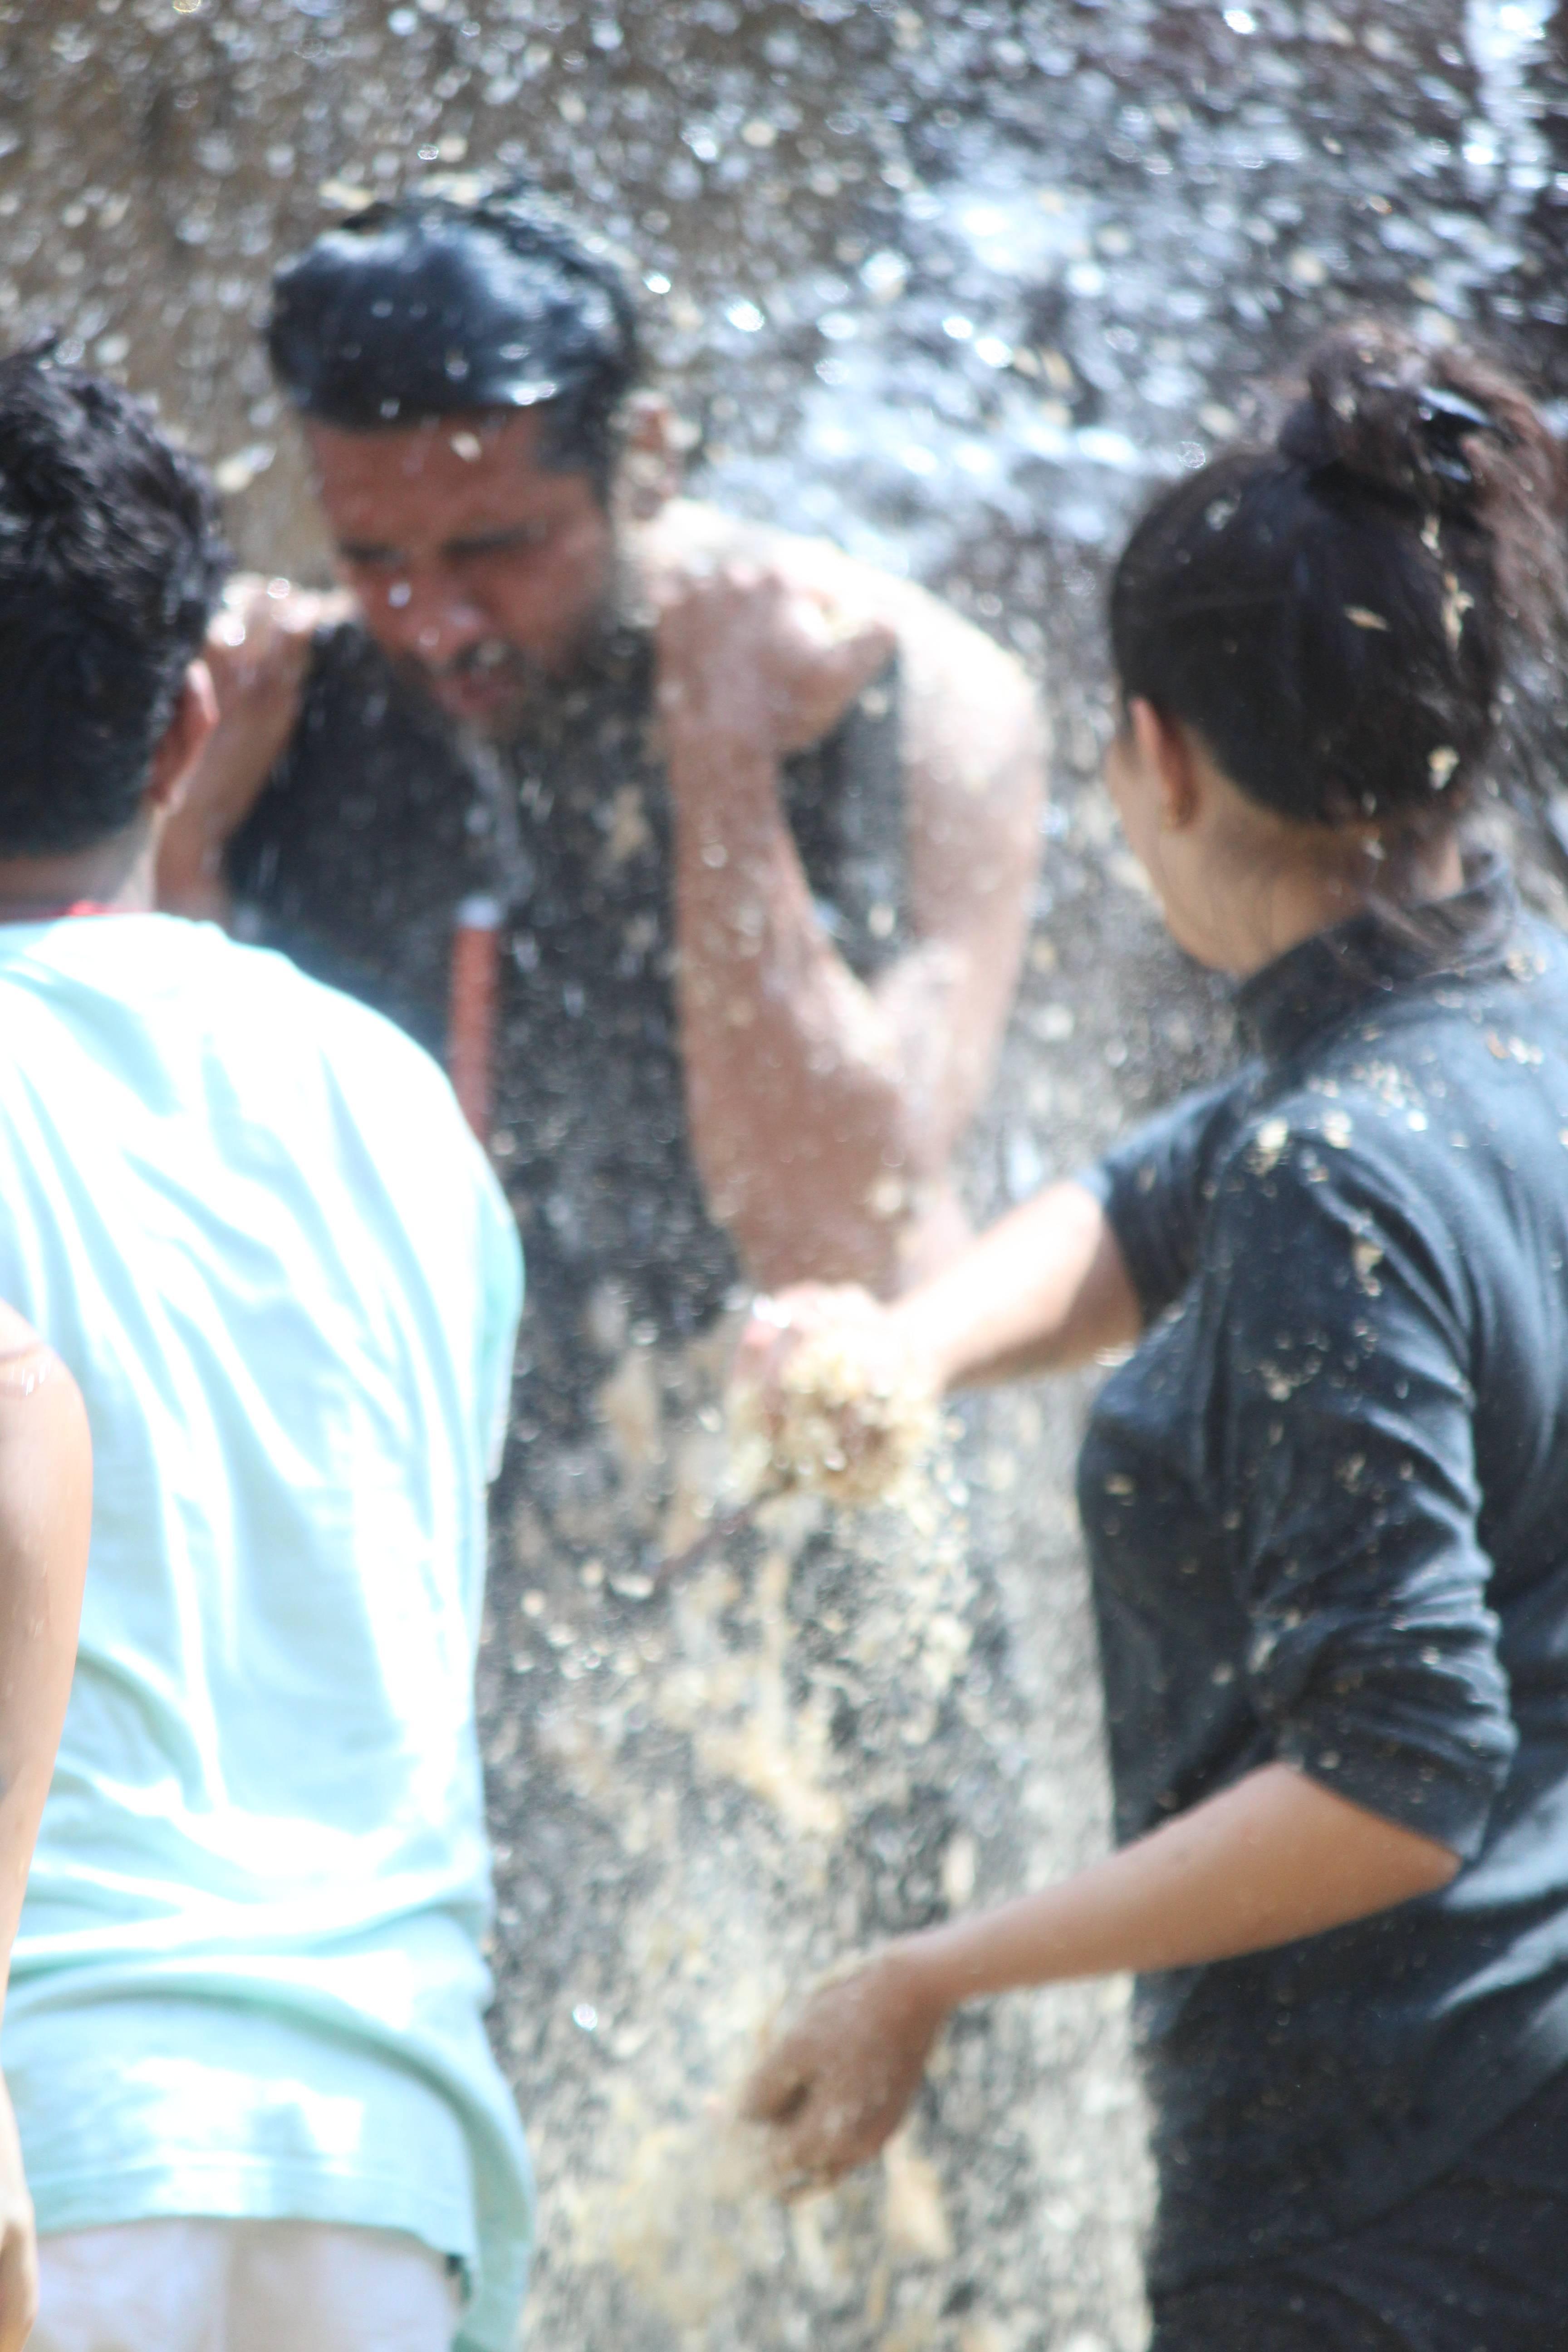 'Jamm ke badla' by Vikas's team on Bigg Boss 11 during luxury budget task!